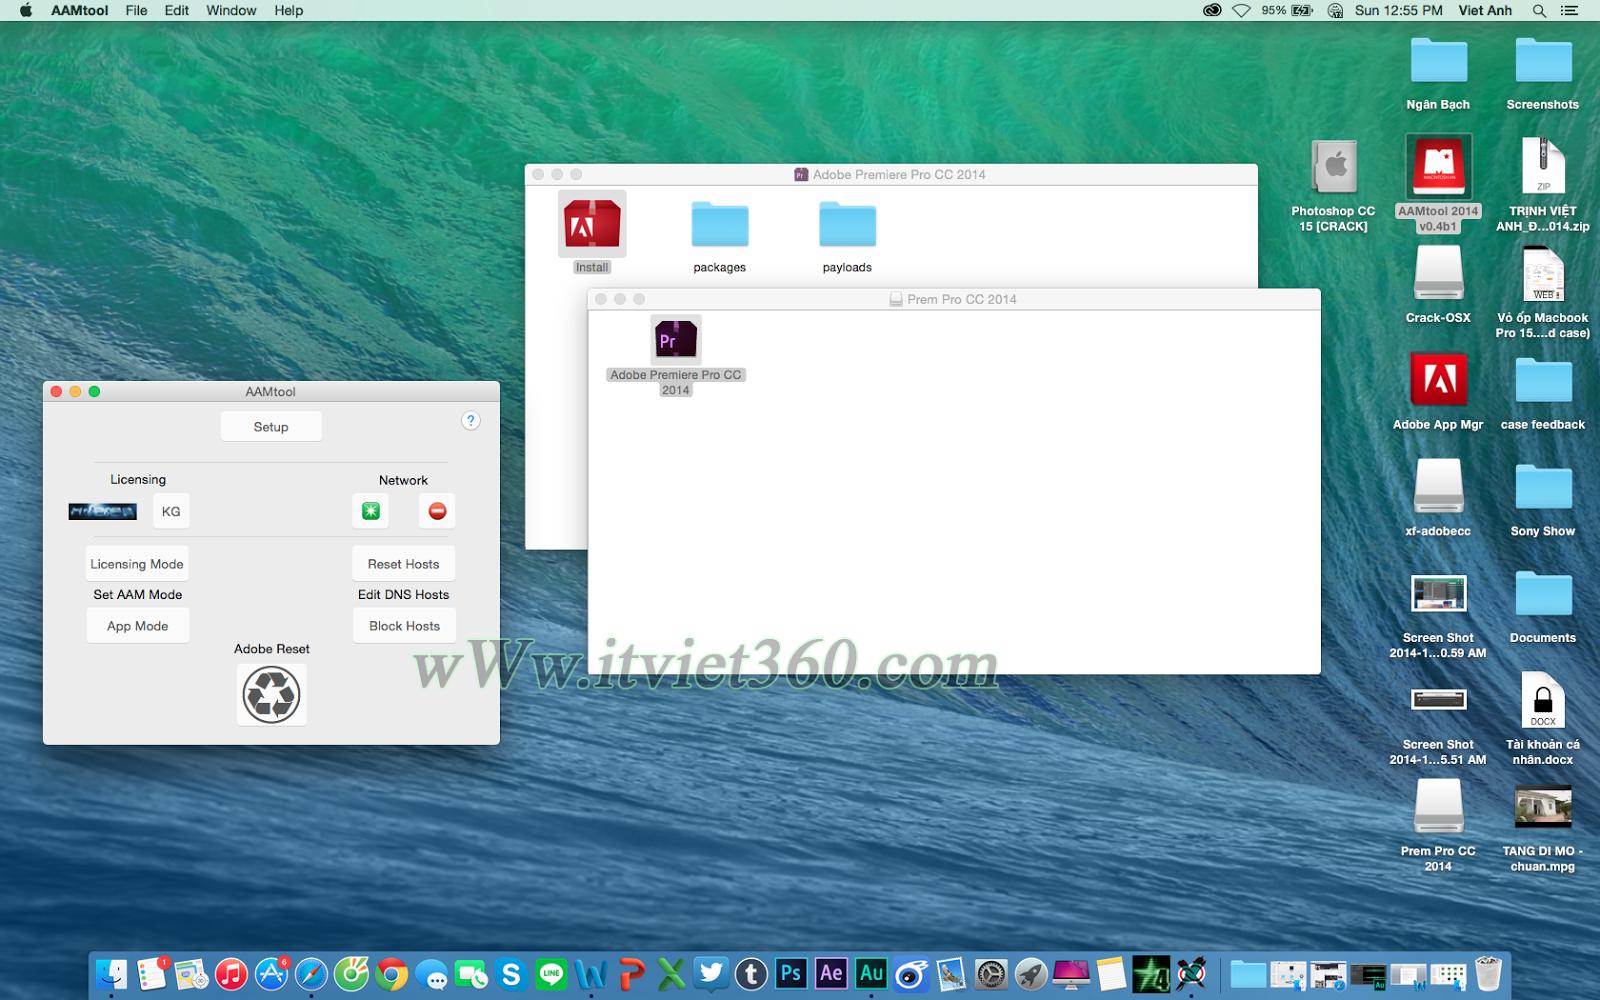 Cai dat phptoshop CC 2014 cho Macbook Air 2013